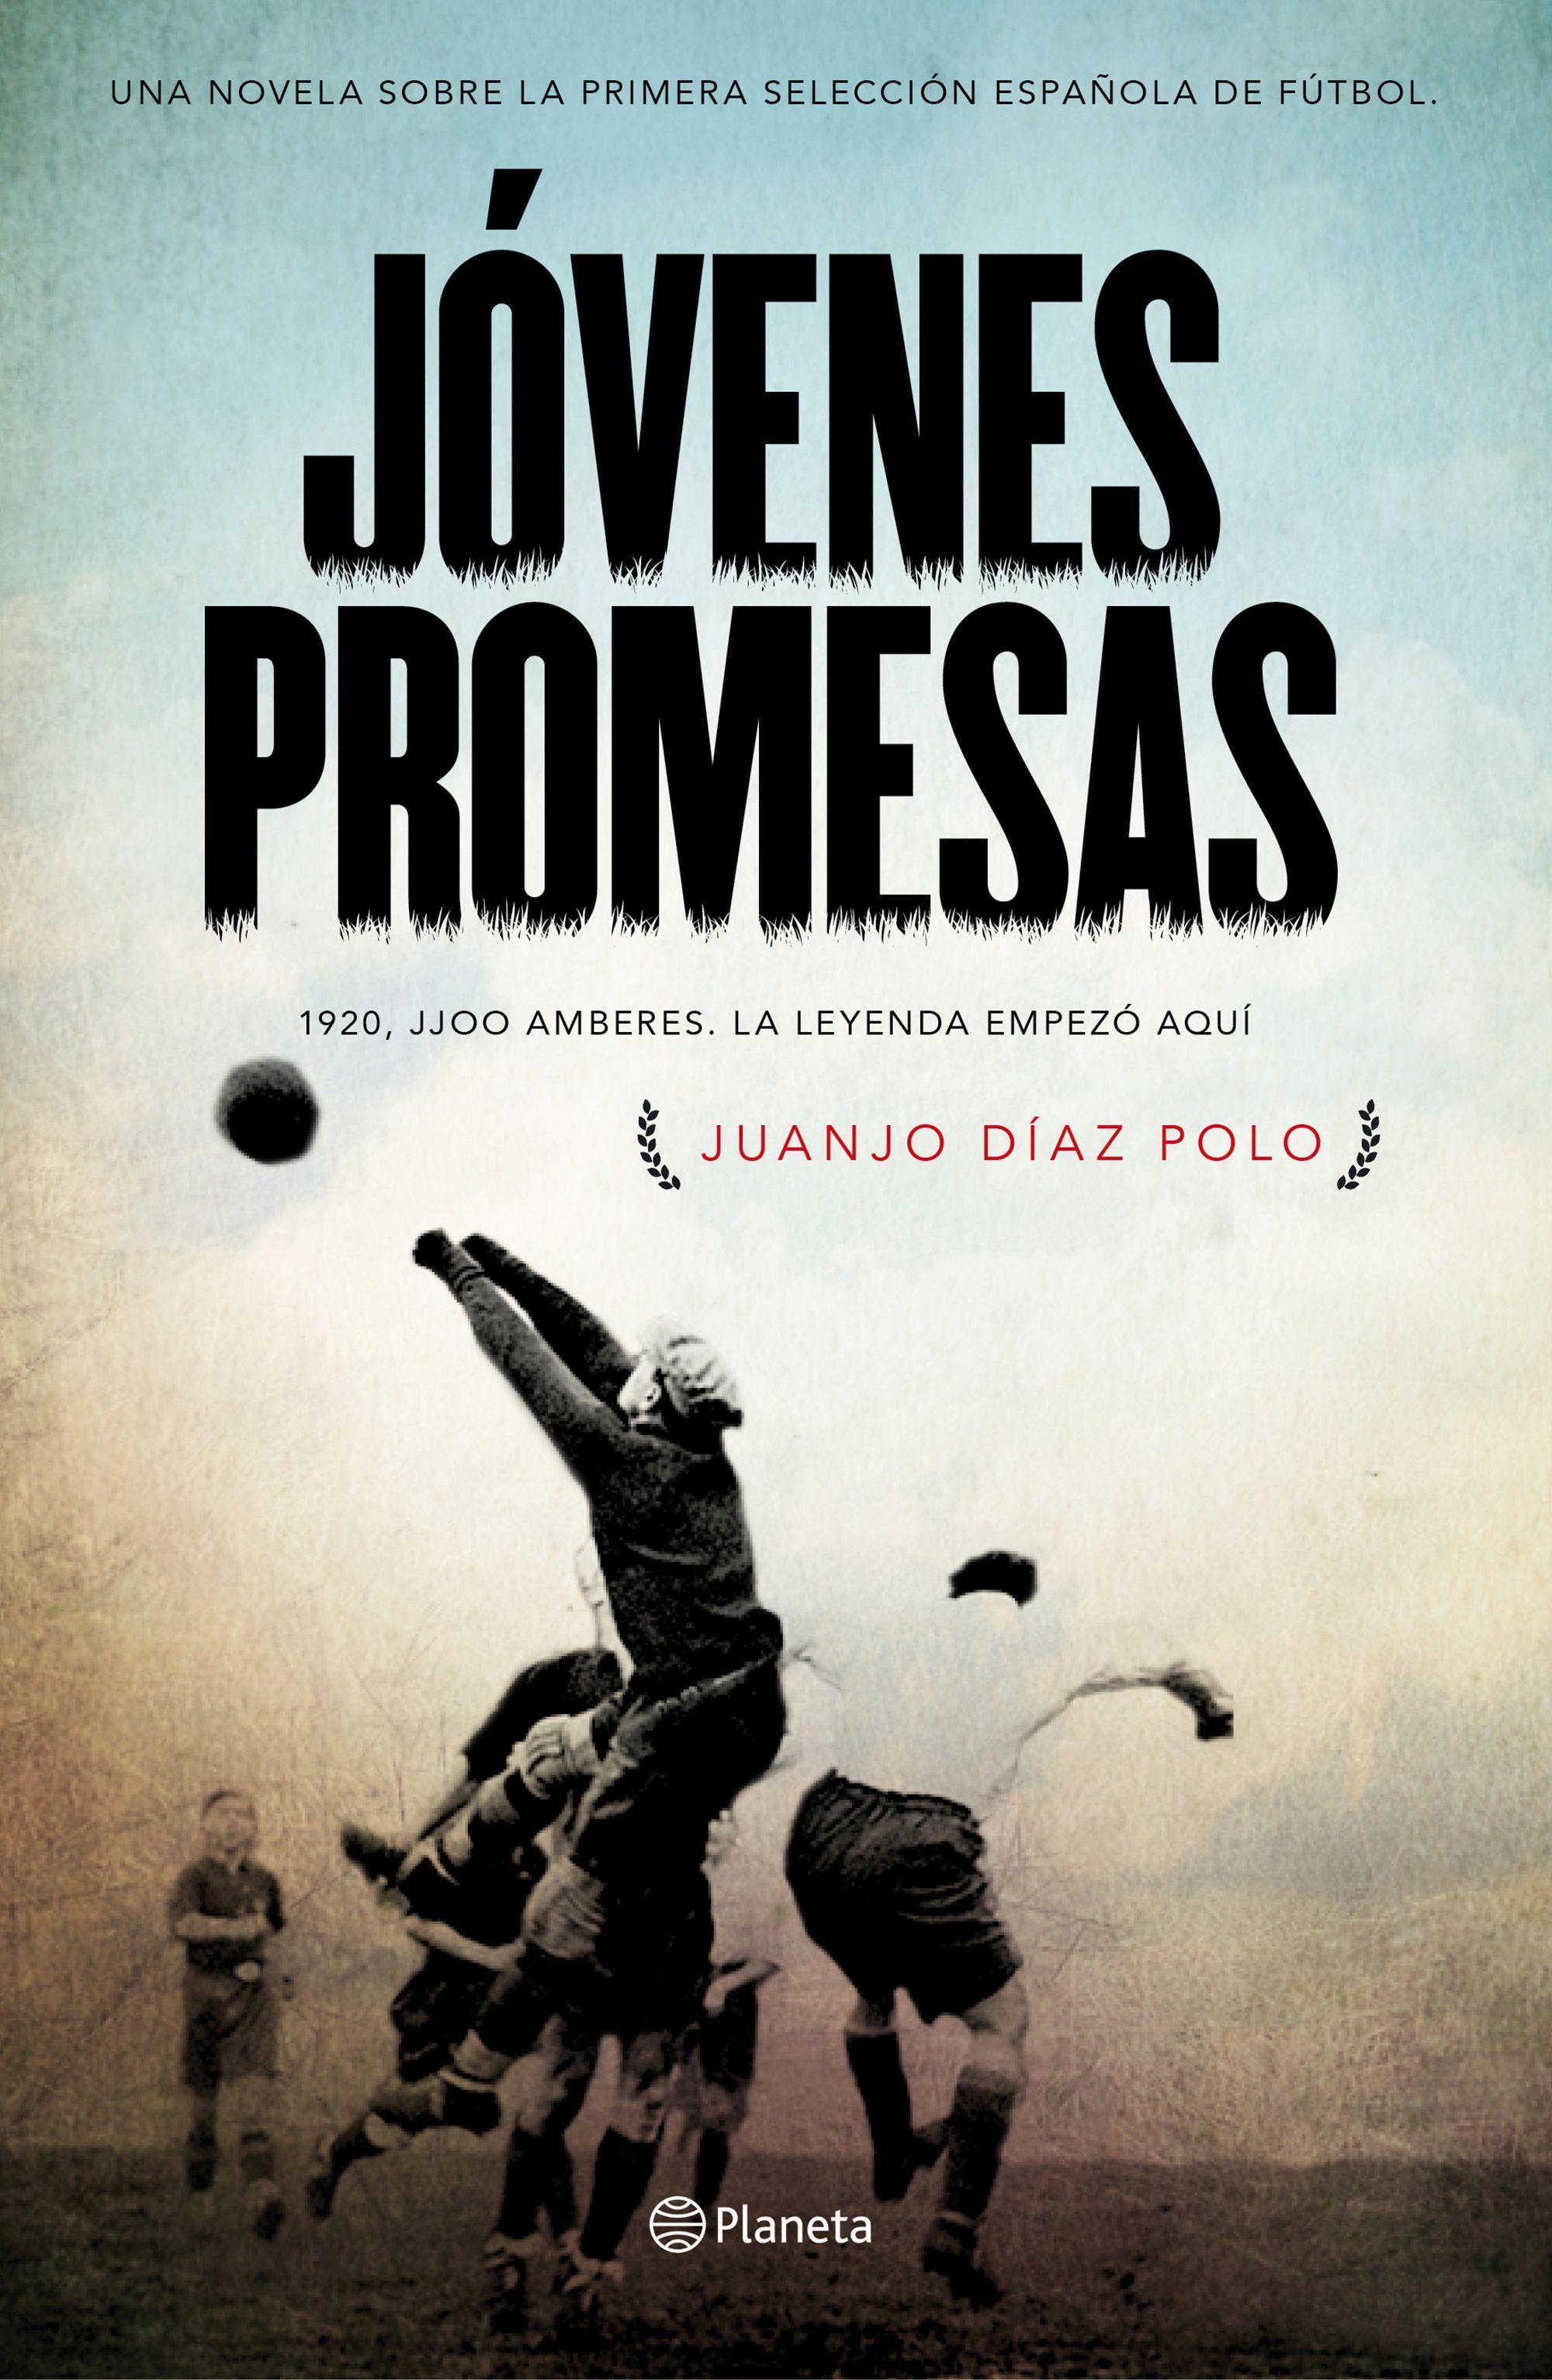 JOVENES PROMESAS. 1920. JJOO AMBERES. LA LEYENDA EMPEZO AQUÍ.